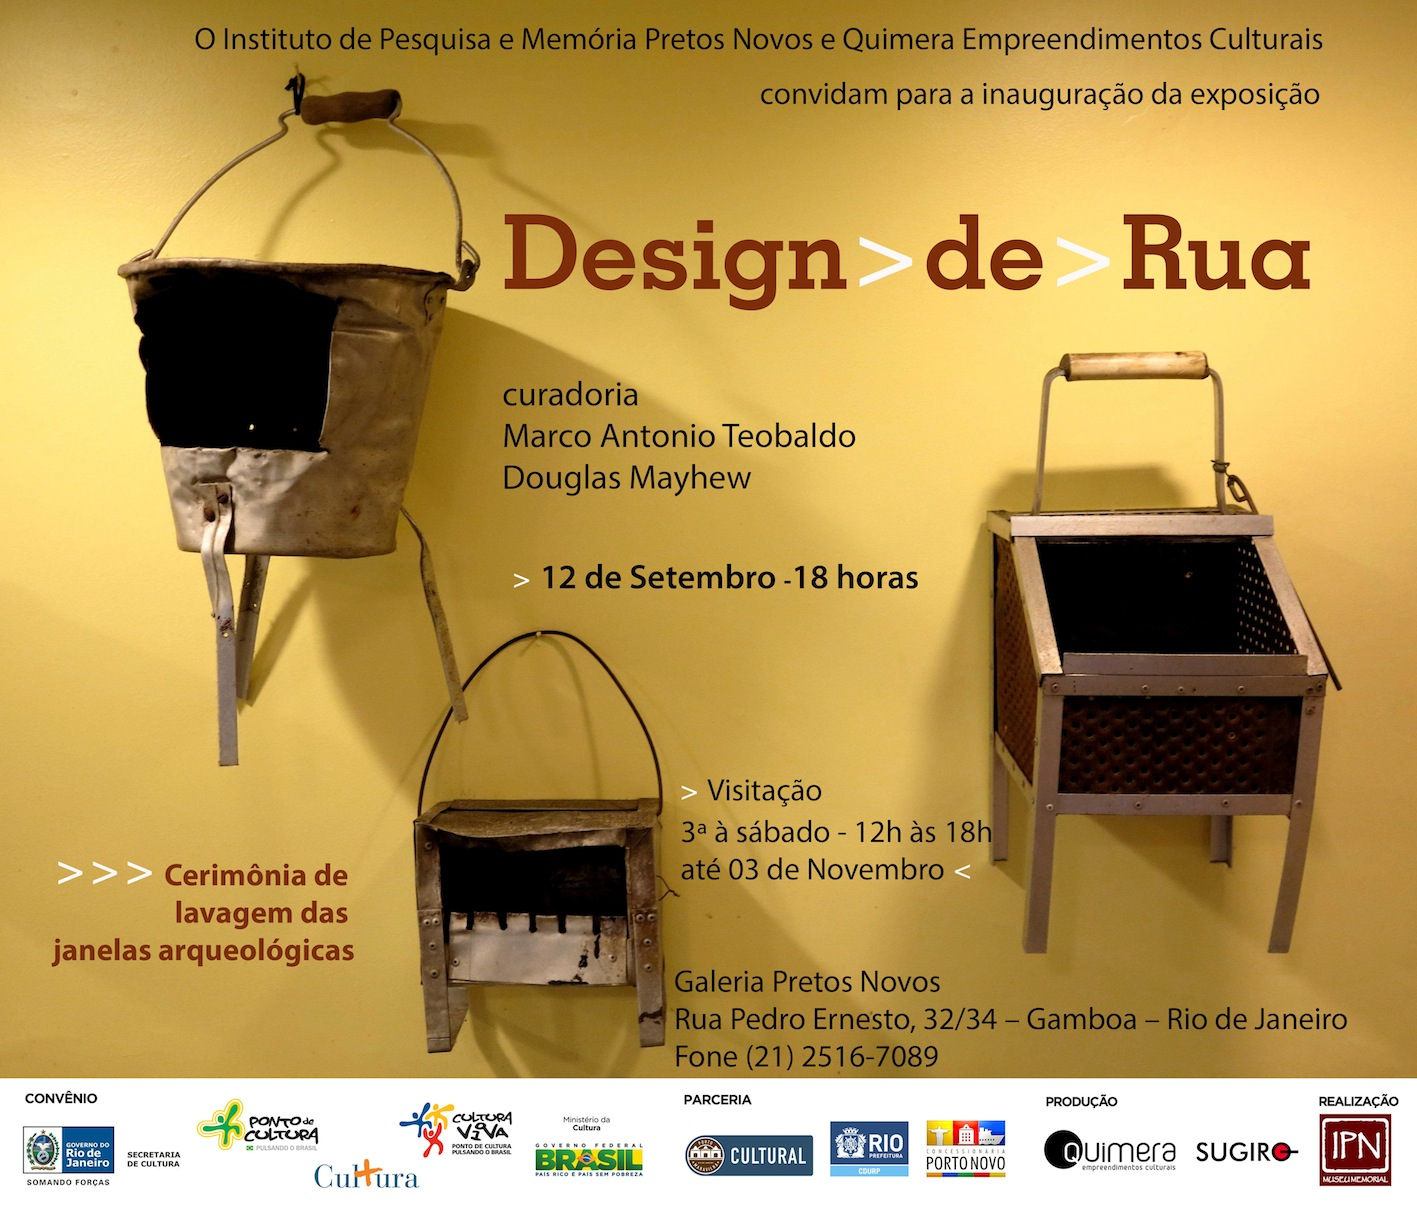 Design de Rua